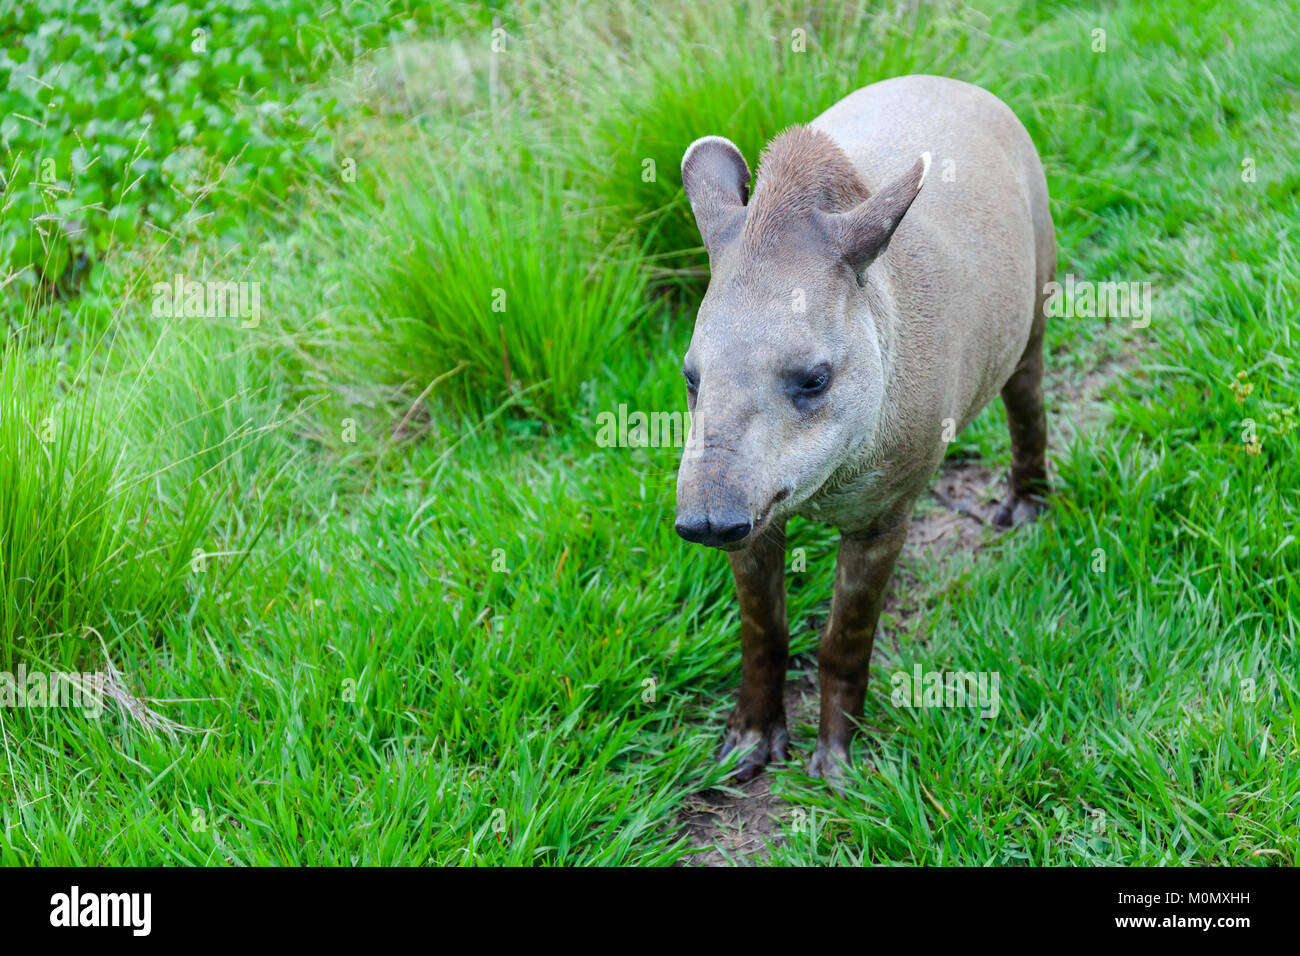 Closeup photo of a South American Tapir Scientific Name: Tapirus terrestris Stock - Stock Image